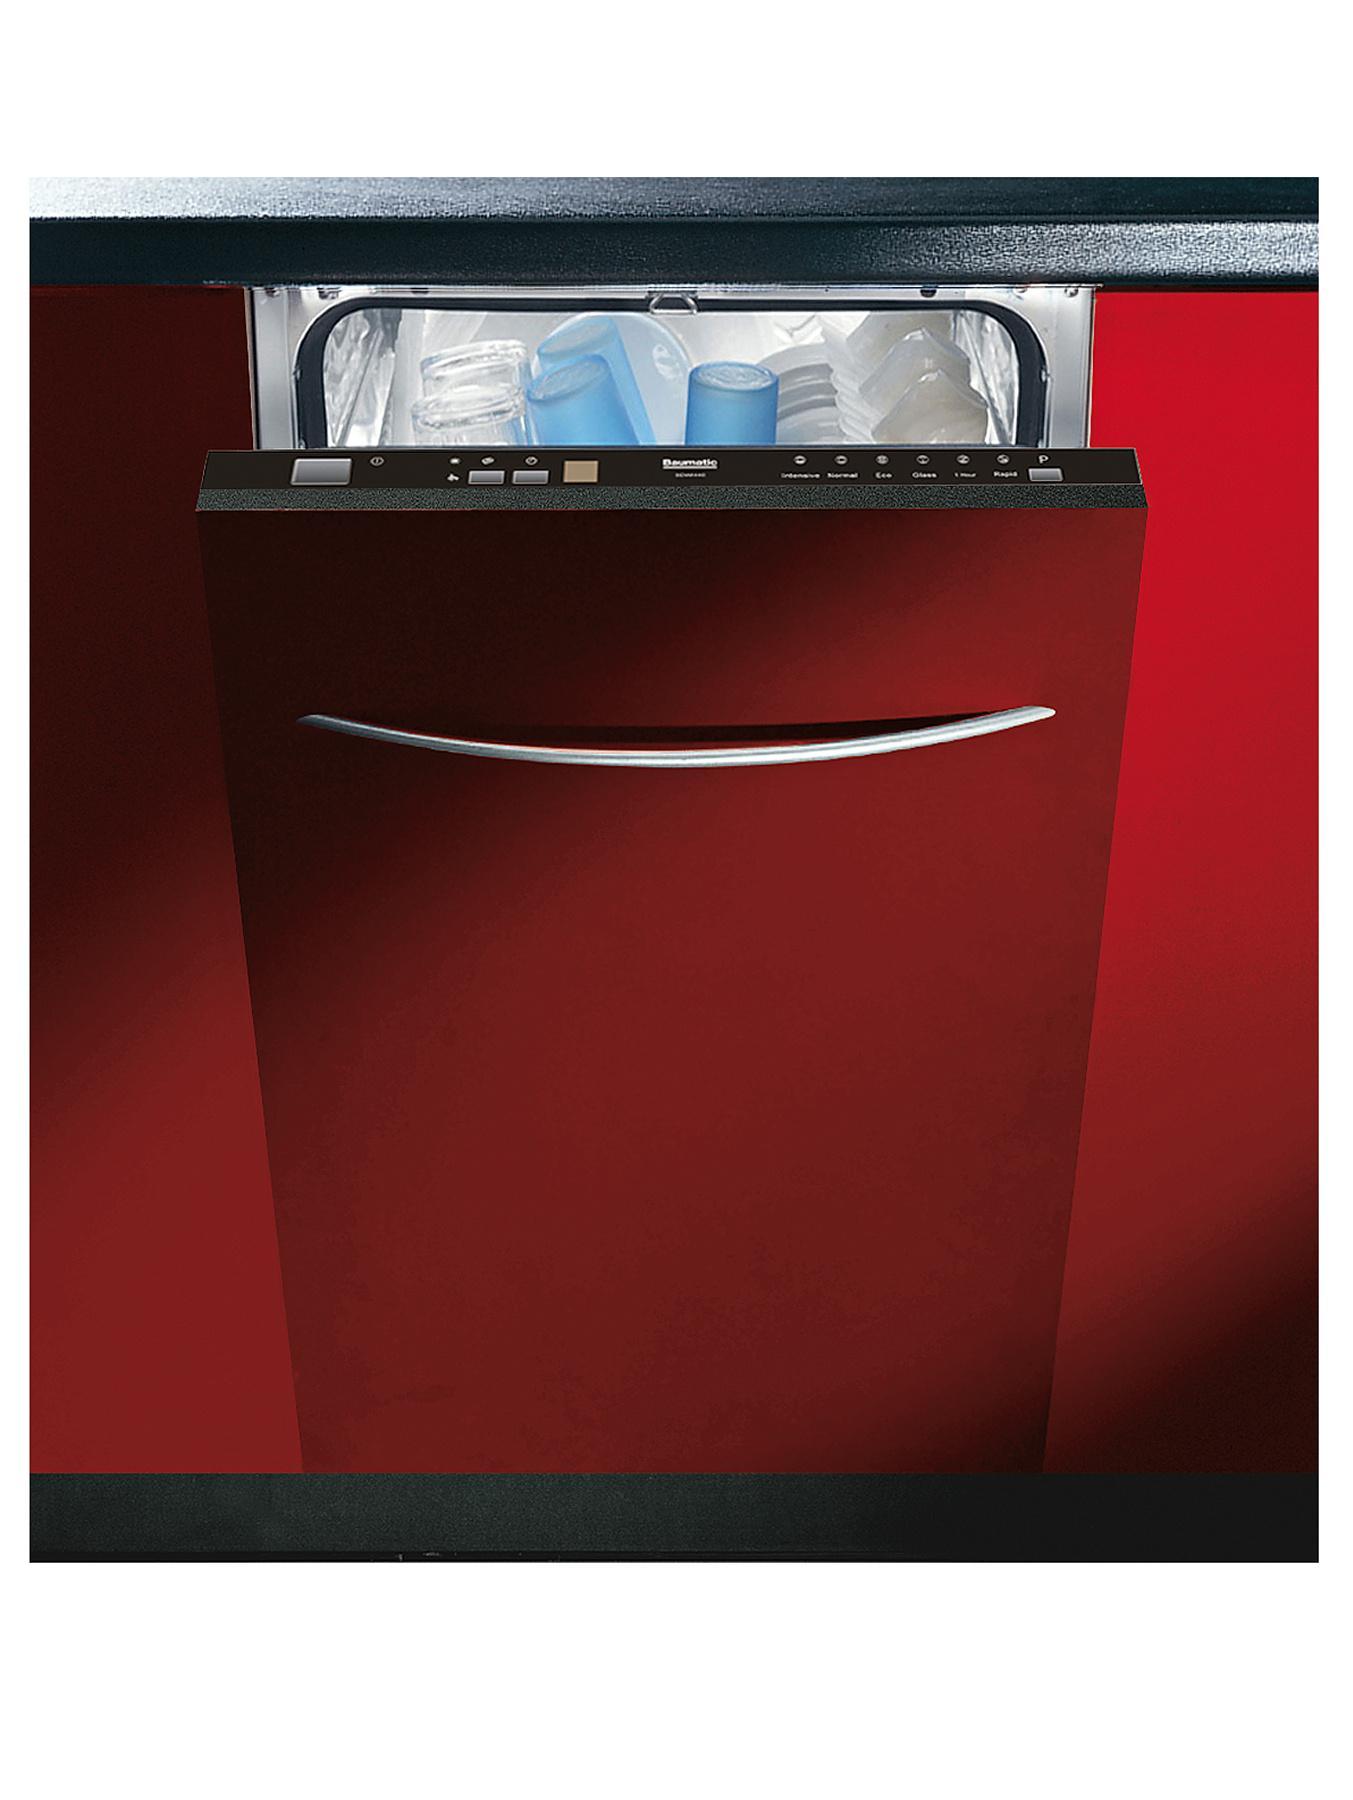 BDWI440 9 Place Slimline Integrated Dishwasher